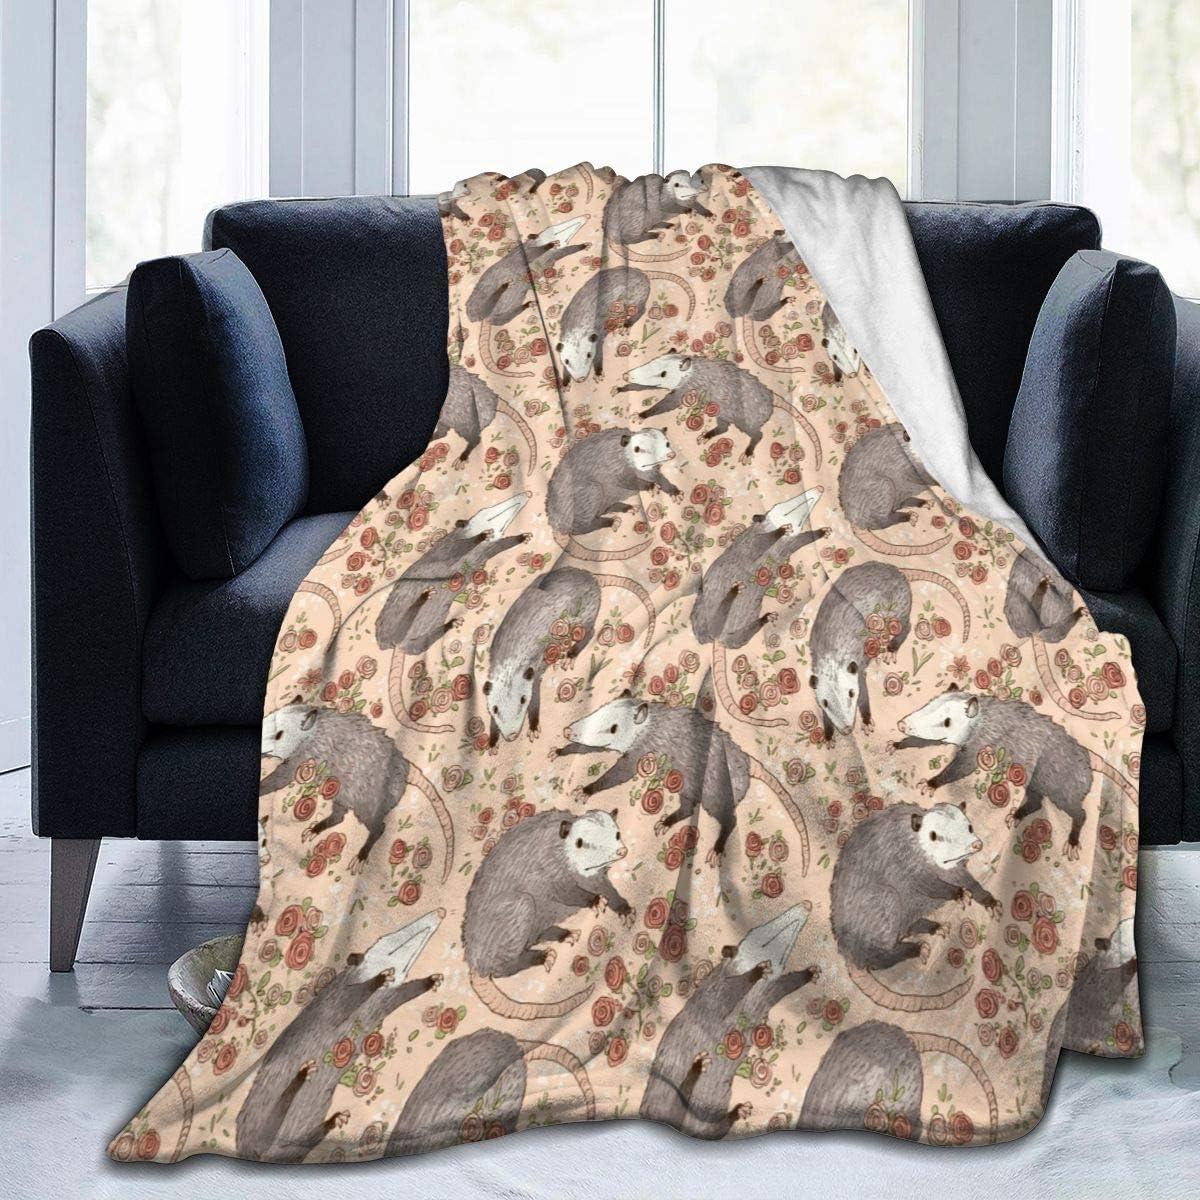 Befuddled Possums Flowers Micro Fleece Blanket Comfy Premium Flannel Fleece Blanket Comfortable Thermal Fleece Blankets Durable Pad Bed Cover Warm Sofa Blanket for All Season